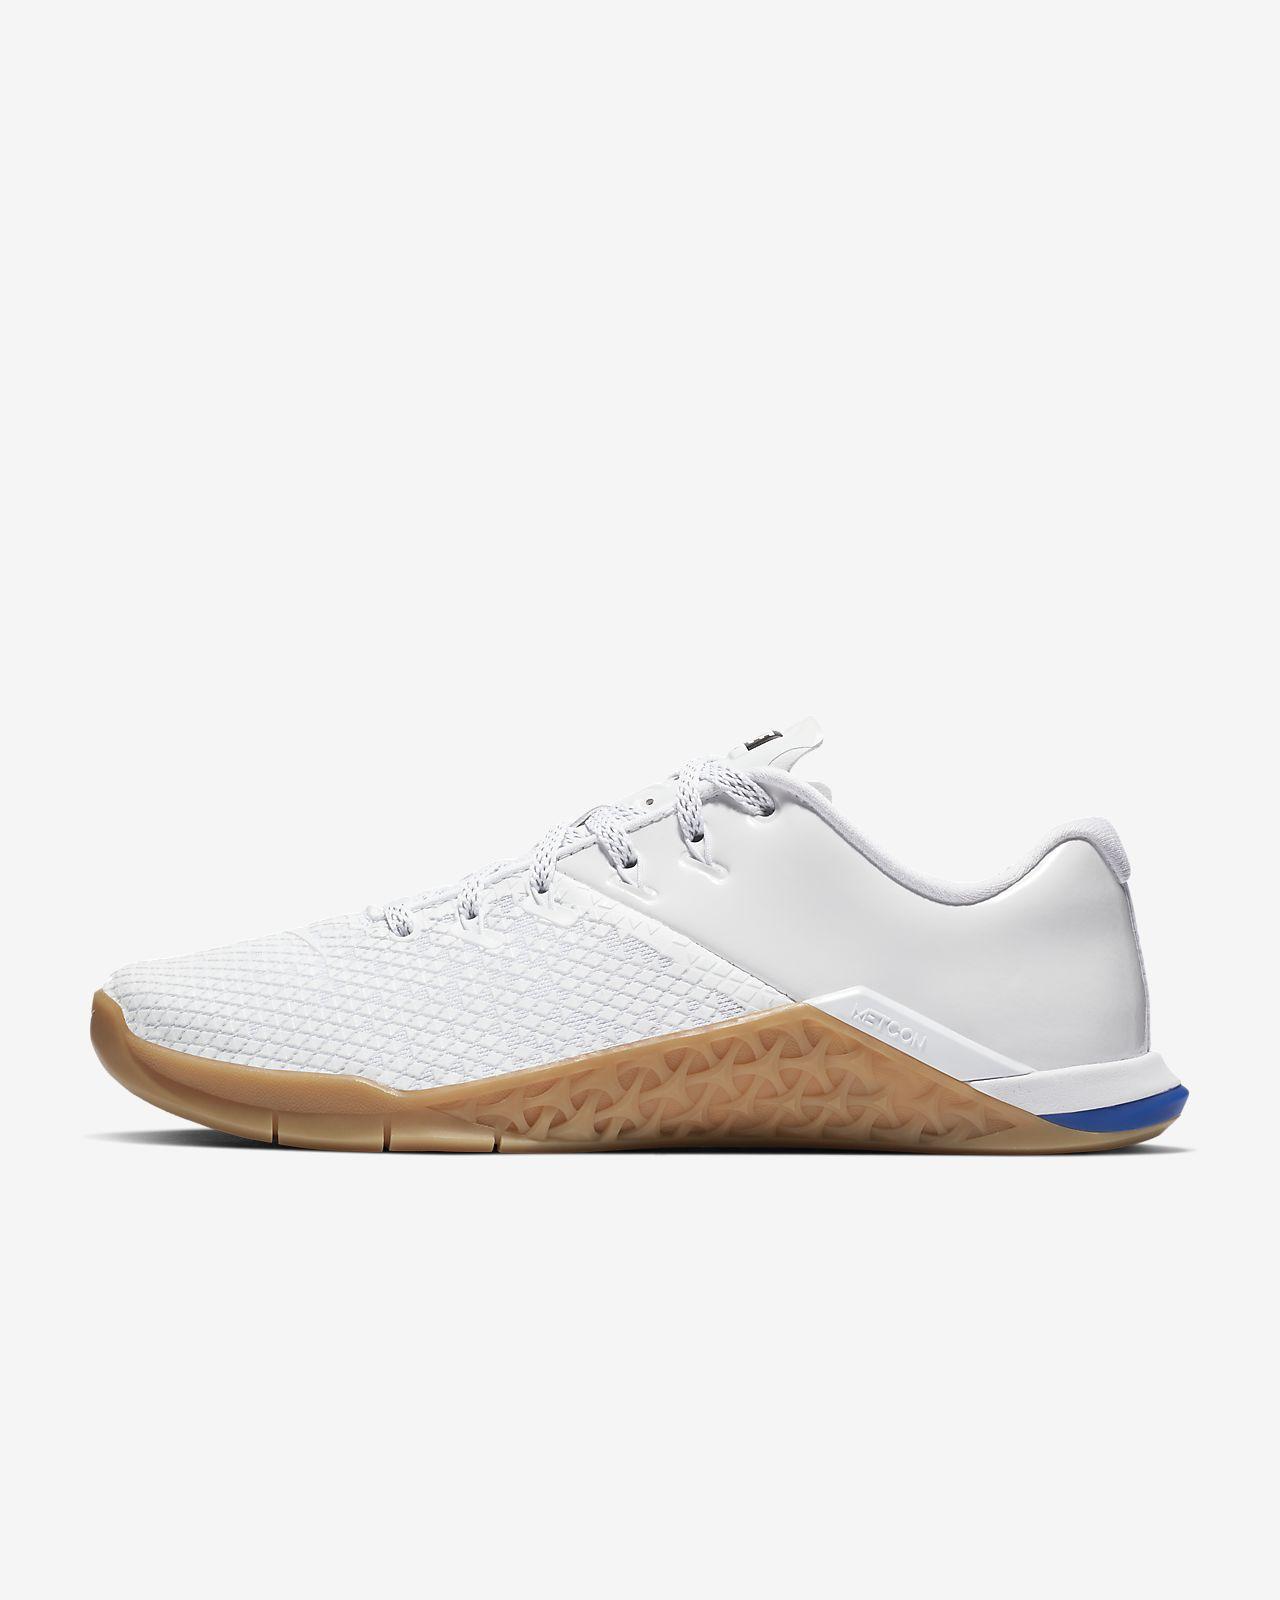 91f913319db4 Women s Cross Training Weightlifting Shoe. Nike Metcon 4 XD X Whiteboard